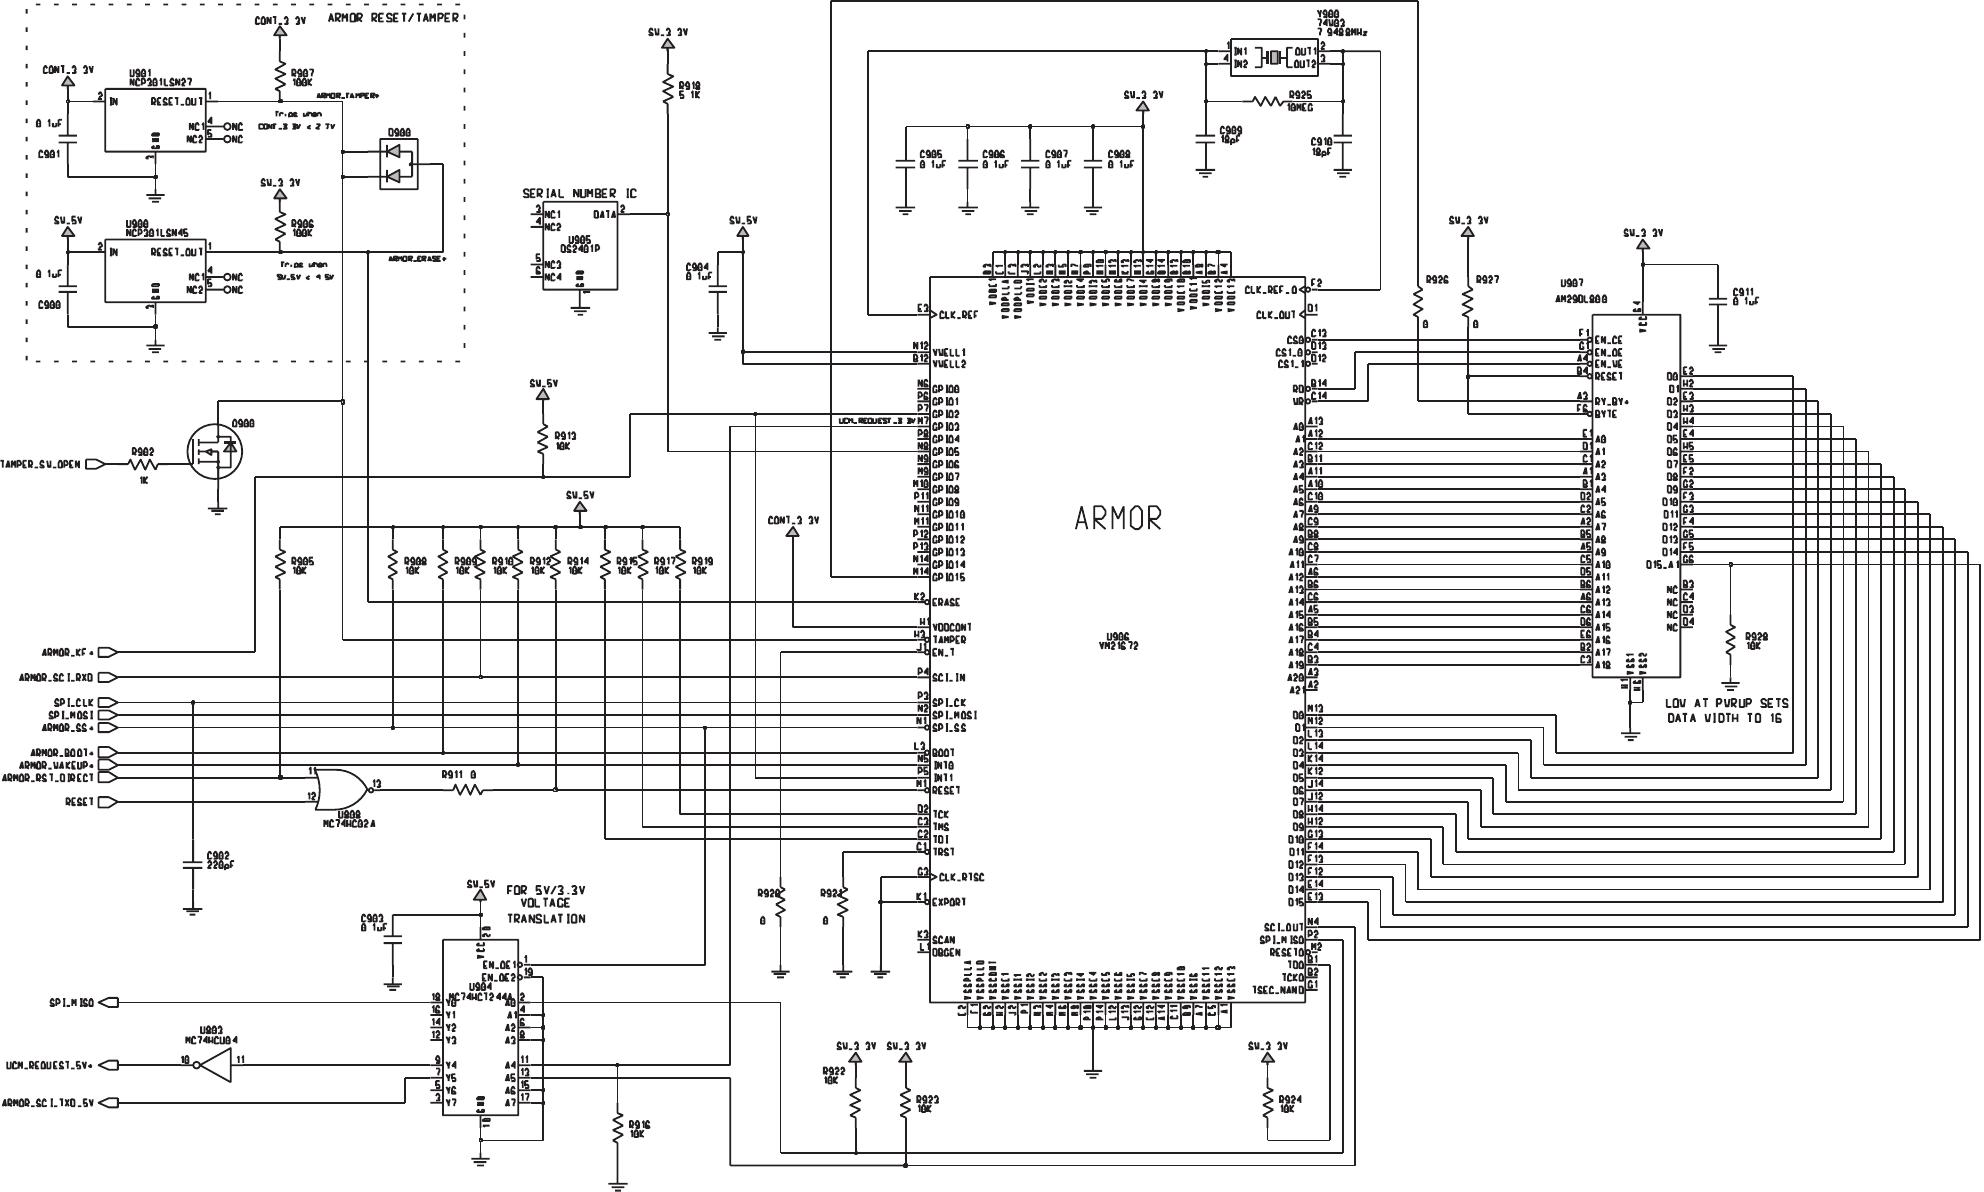 6880802e55 Kvl3000 Plus Service Manual O Keysecure 3b Wiring Diagram February 2004 5 13